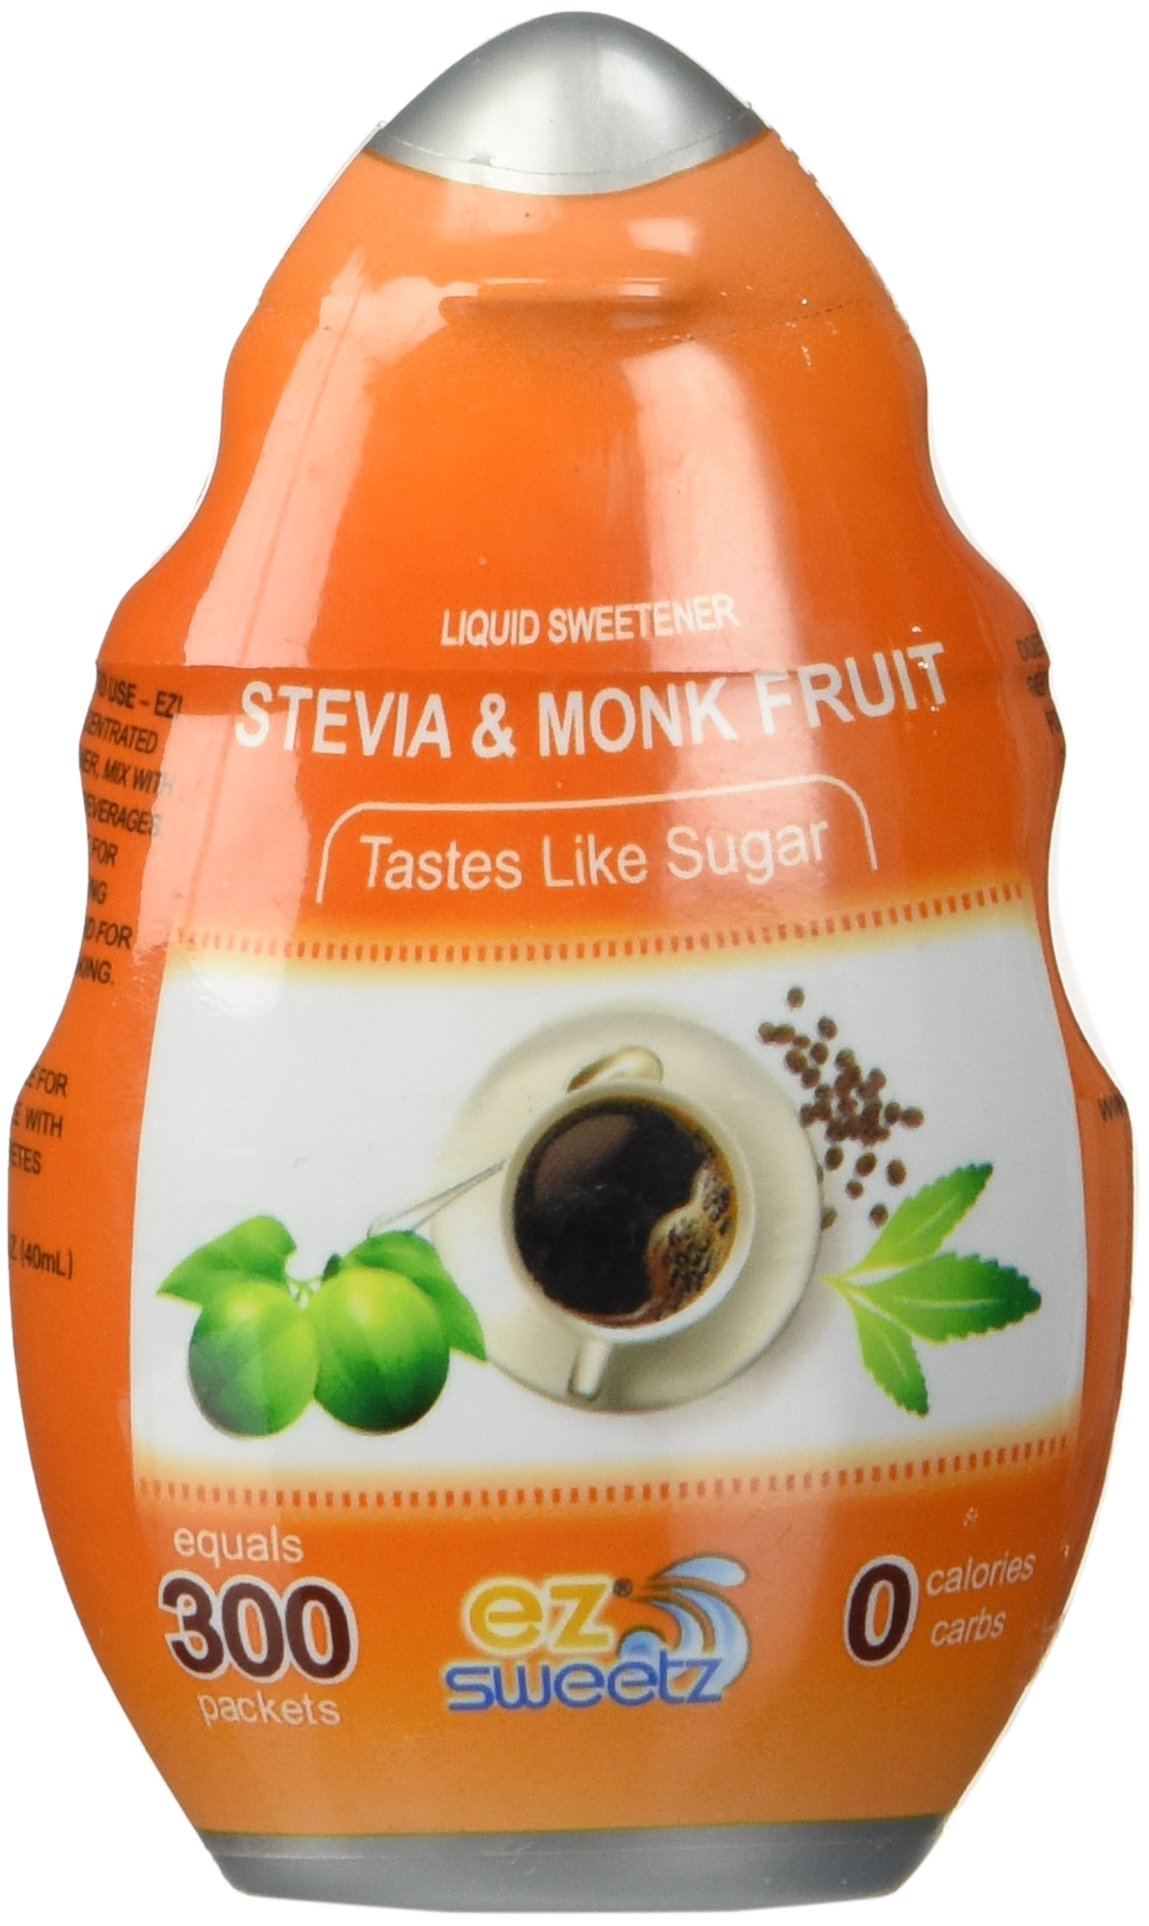 EZ-Sweetz Stevia & Monk Fruit (1.36oz - Liquid Sweetener 300 Servings/Bottle)